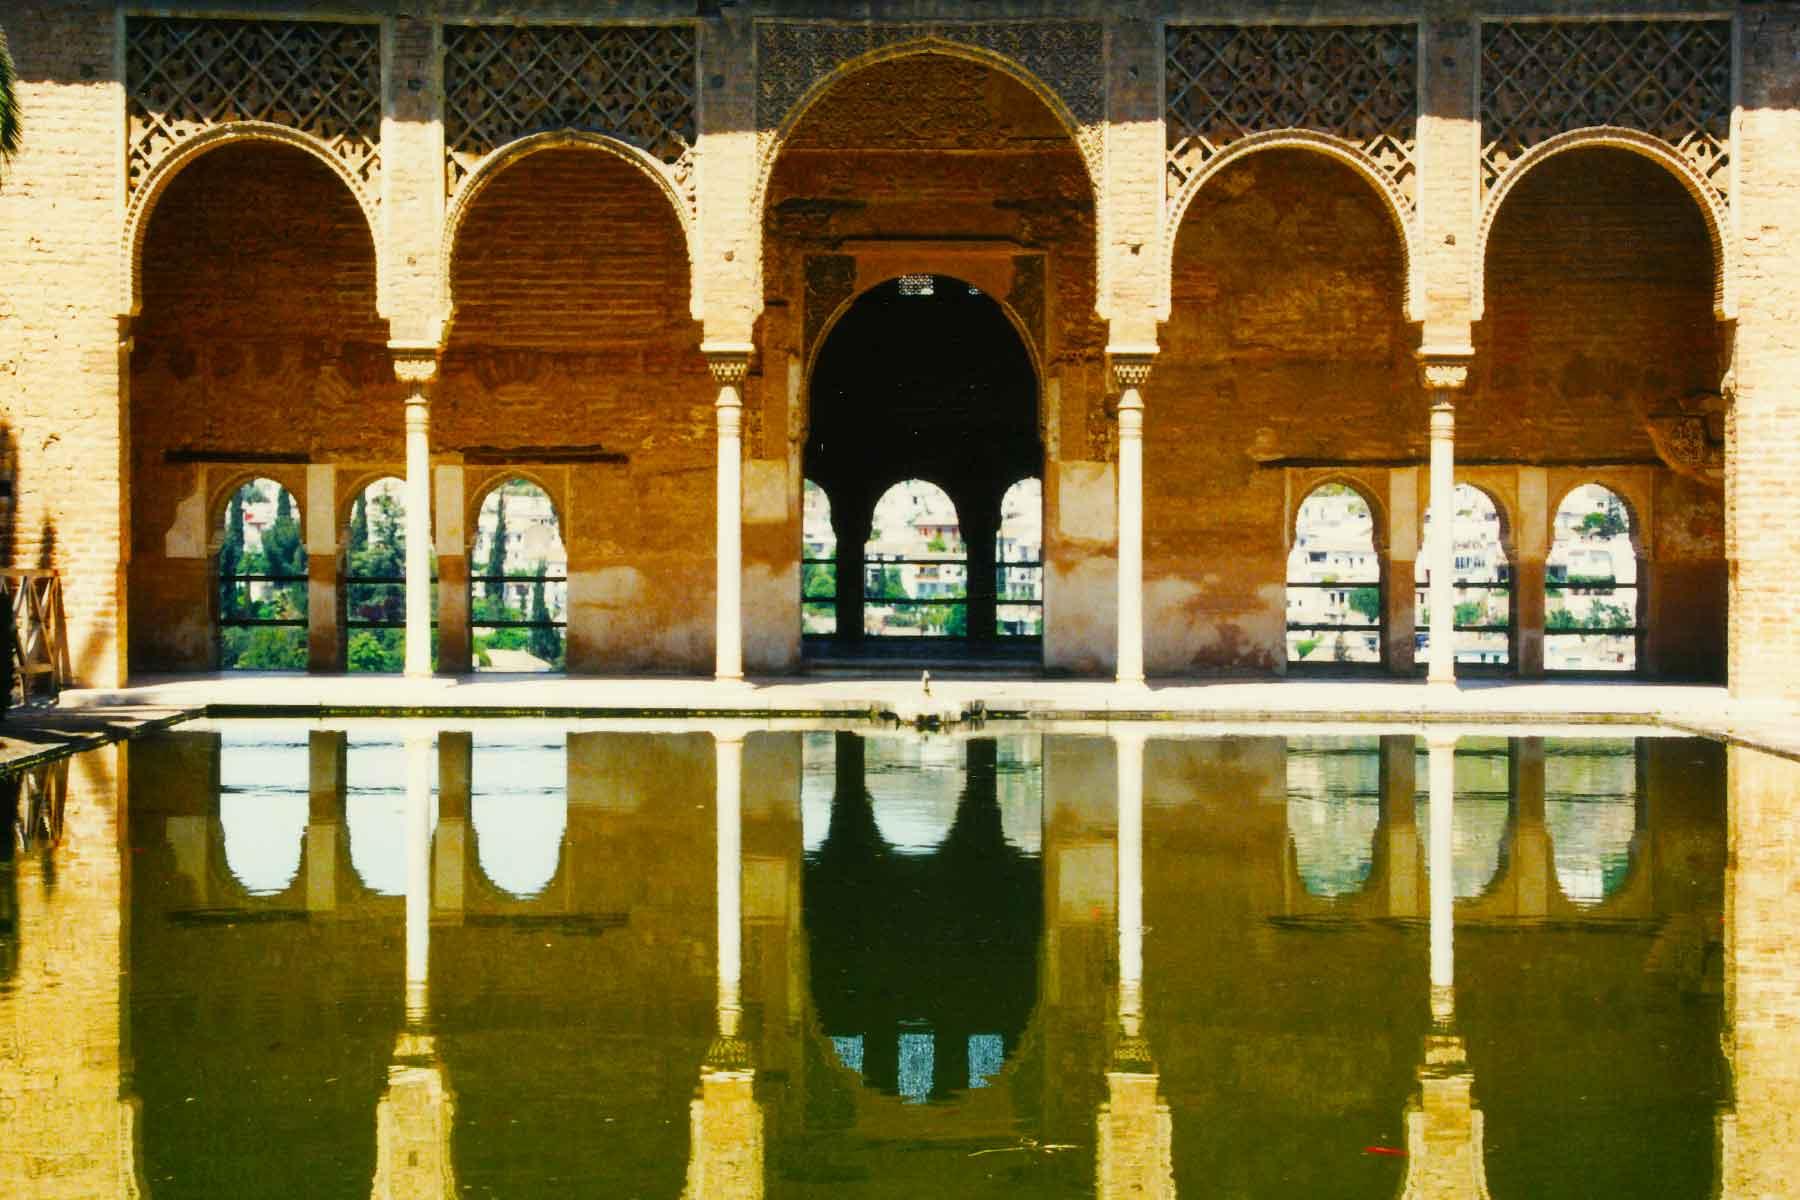 Alhambra - Granada Spain - Study Abroad Journal - Steven Andrew Martin